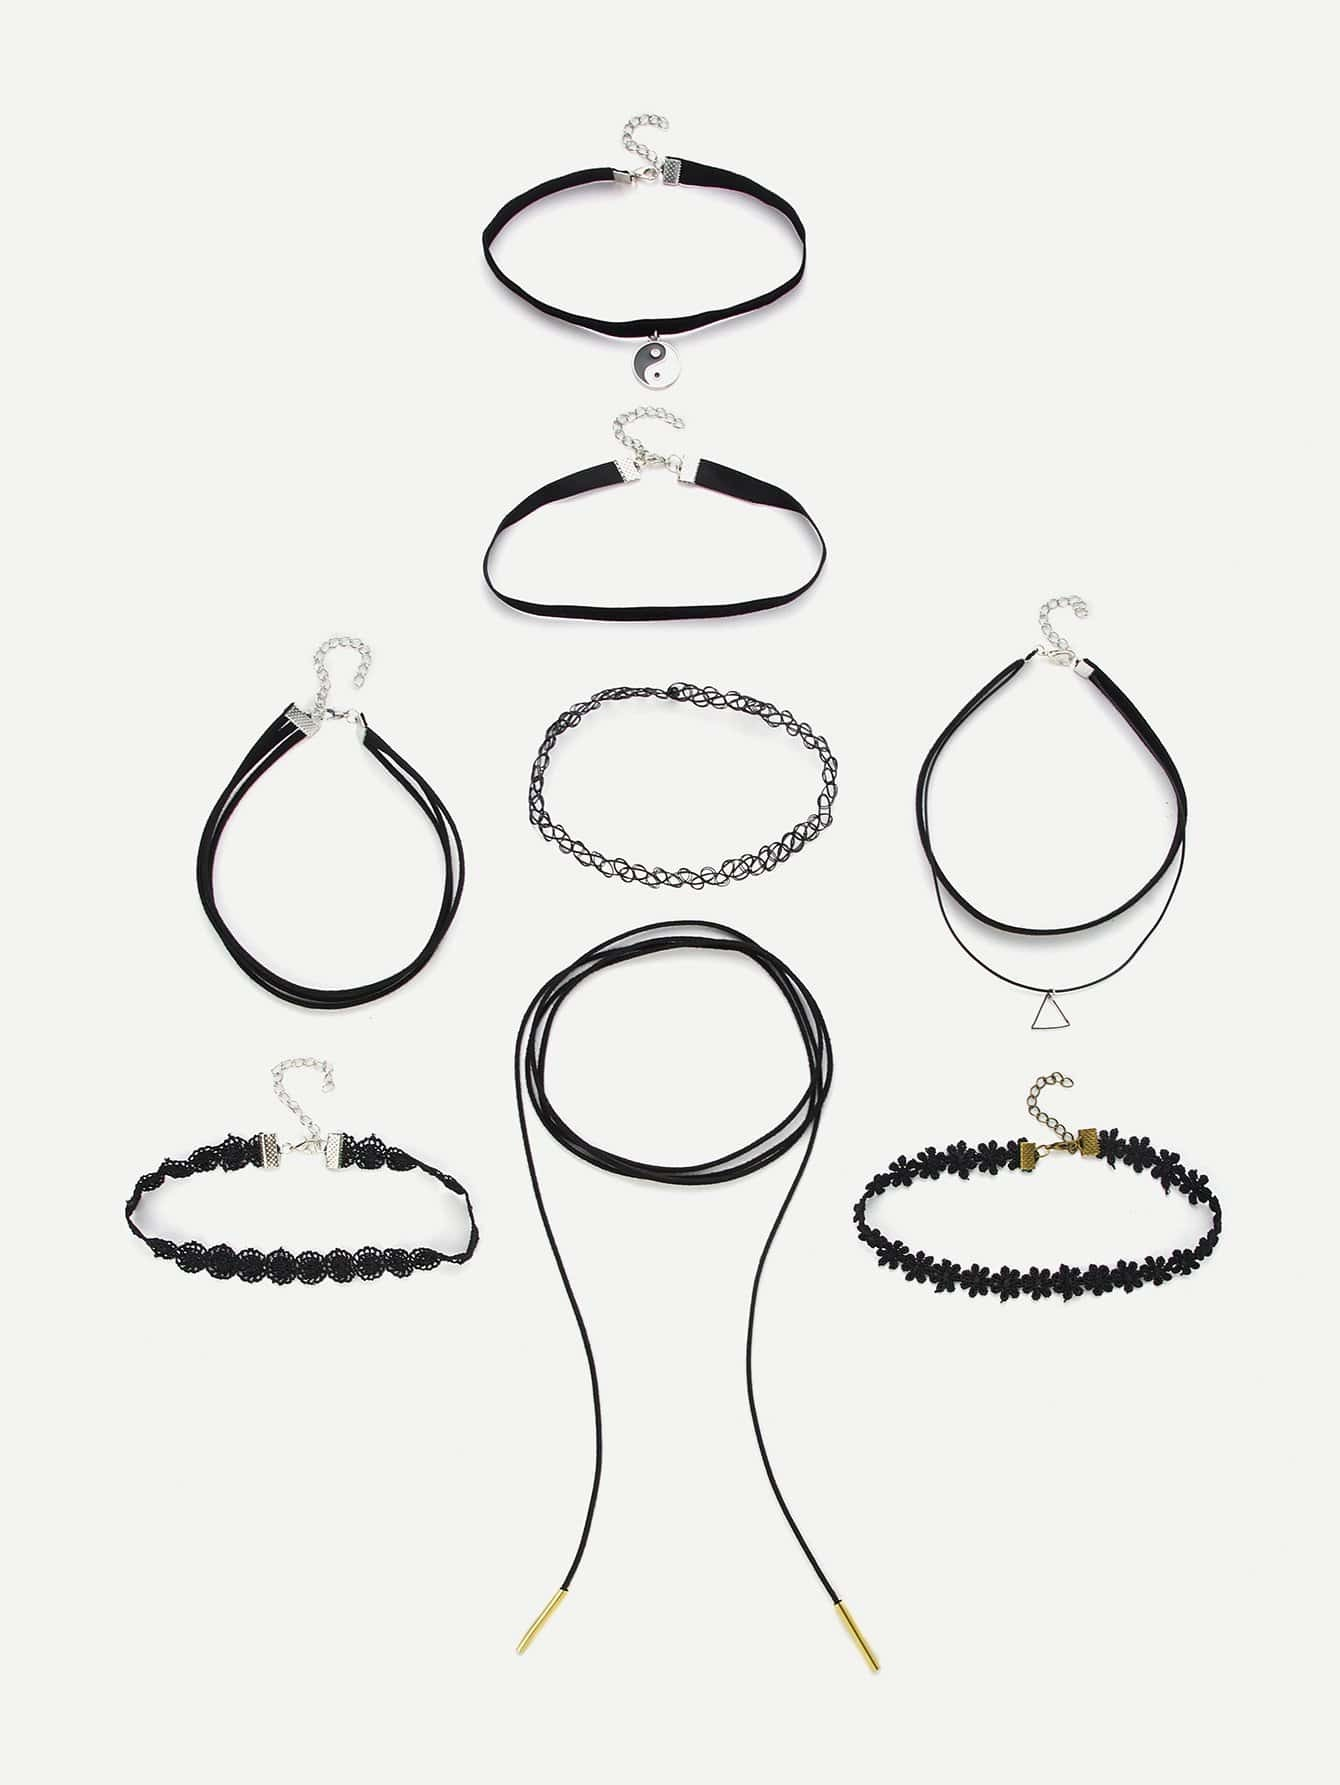 Triangle Pendant Choker Necklace 8pcs triangle fringed paillette pendant necklace